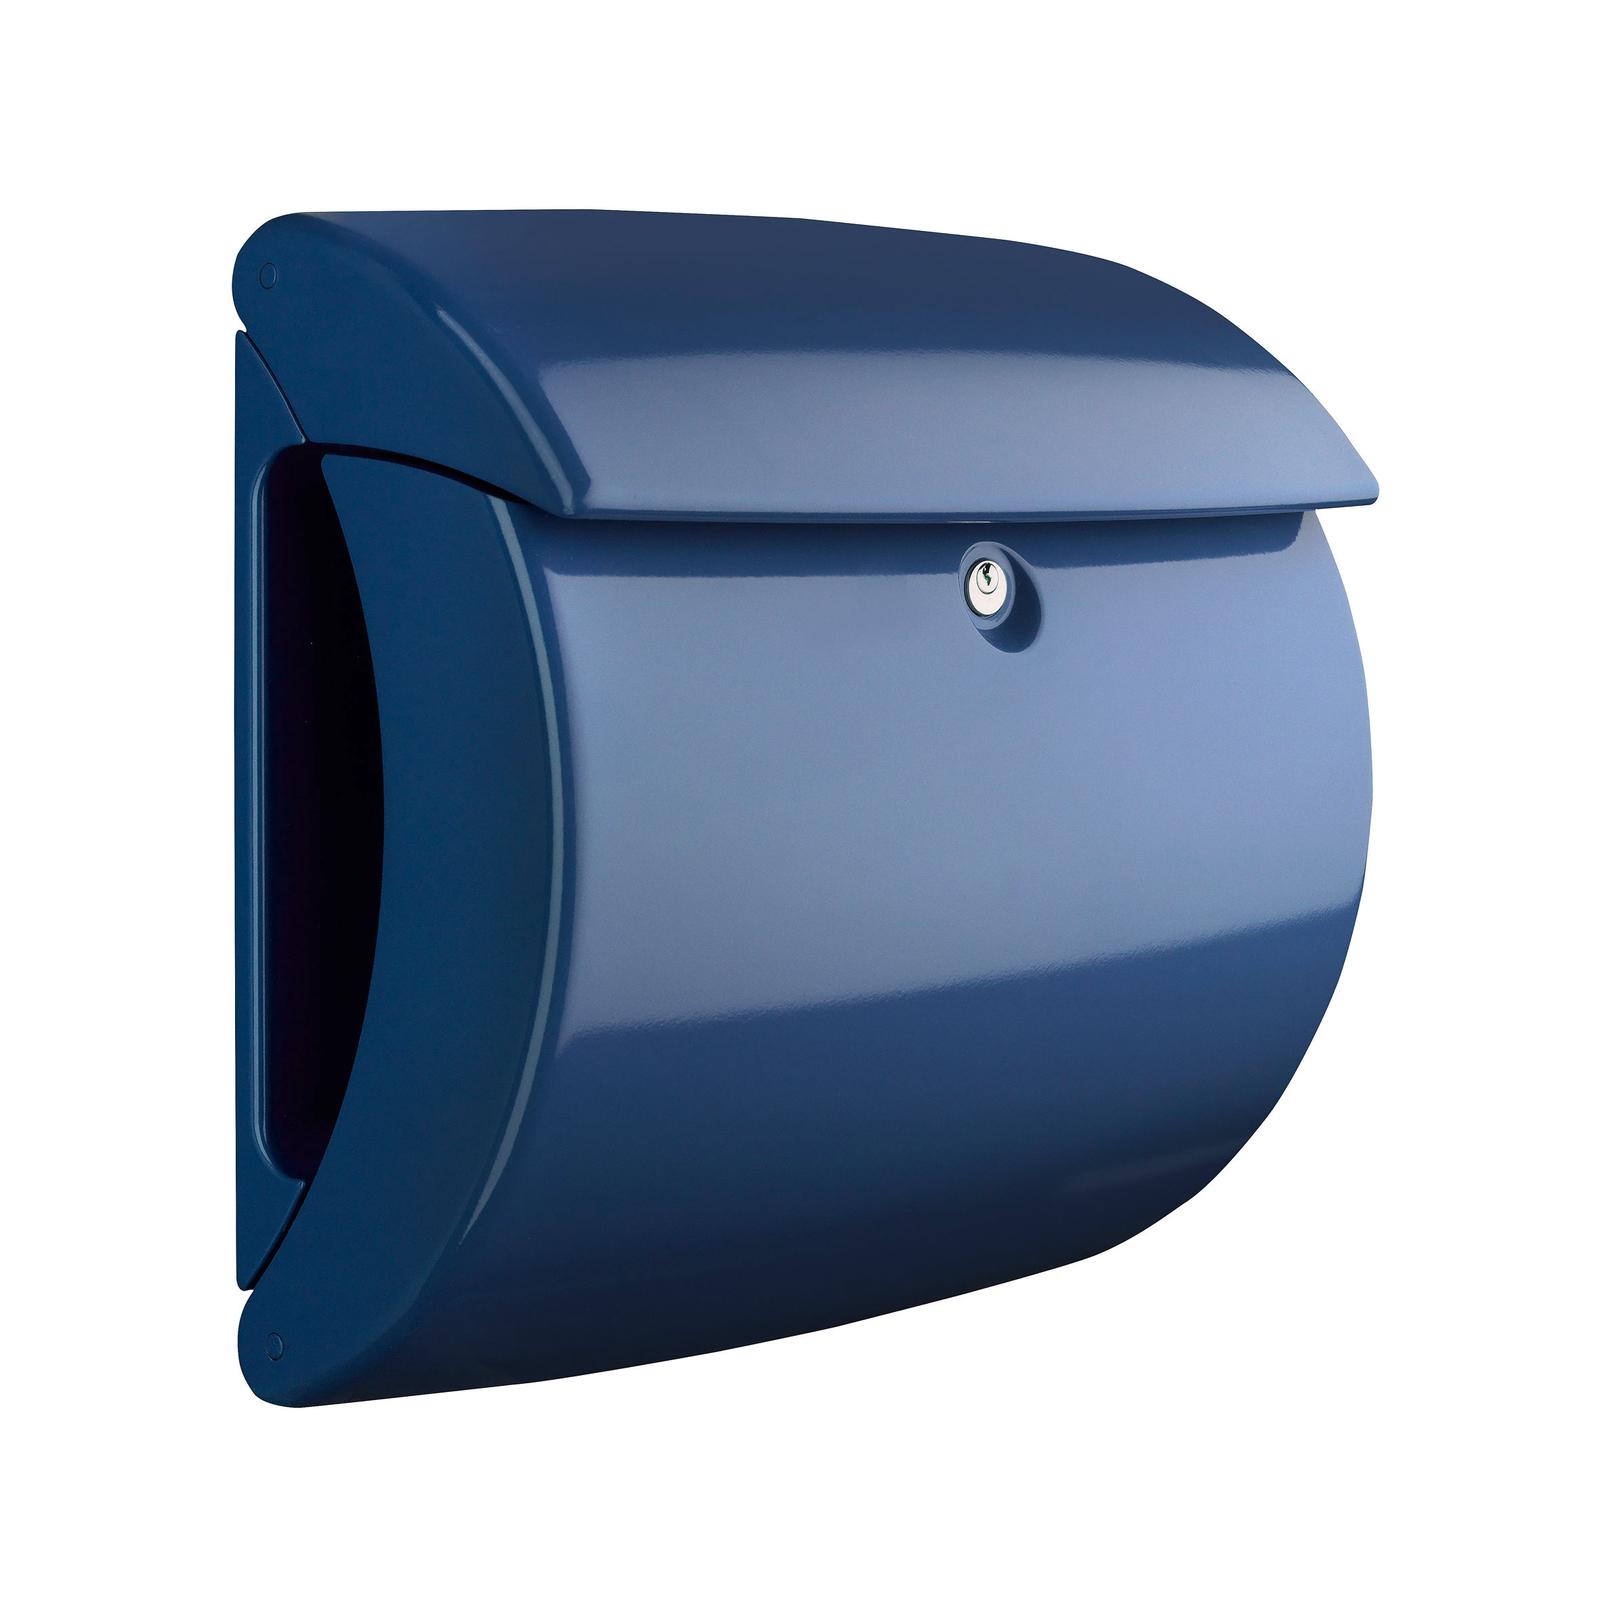 Buzón Piano 886 marine blue